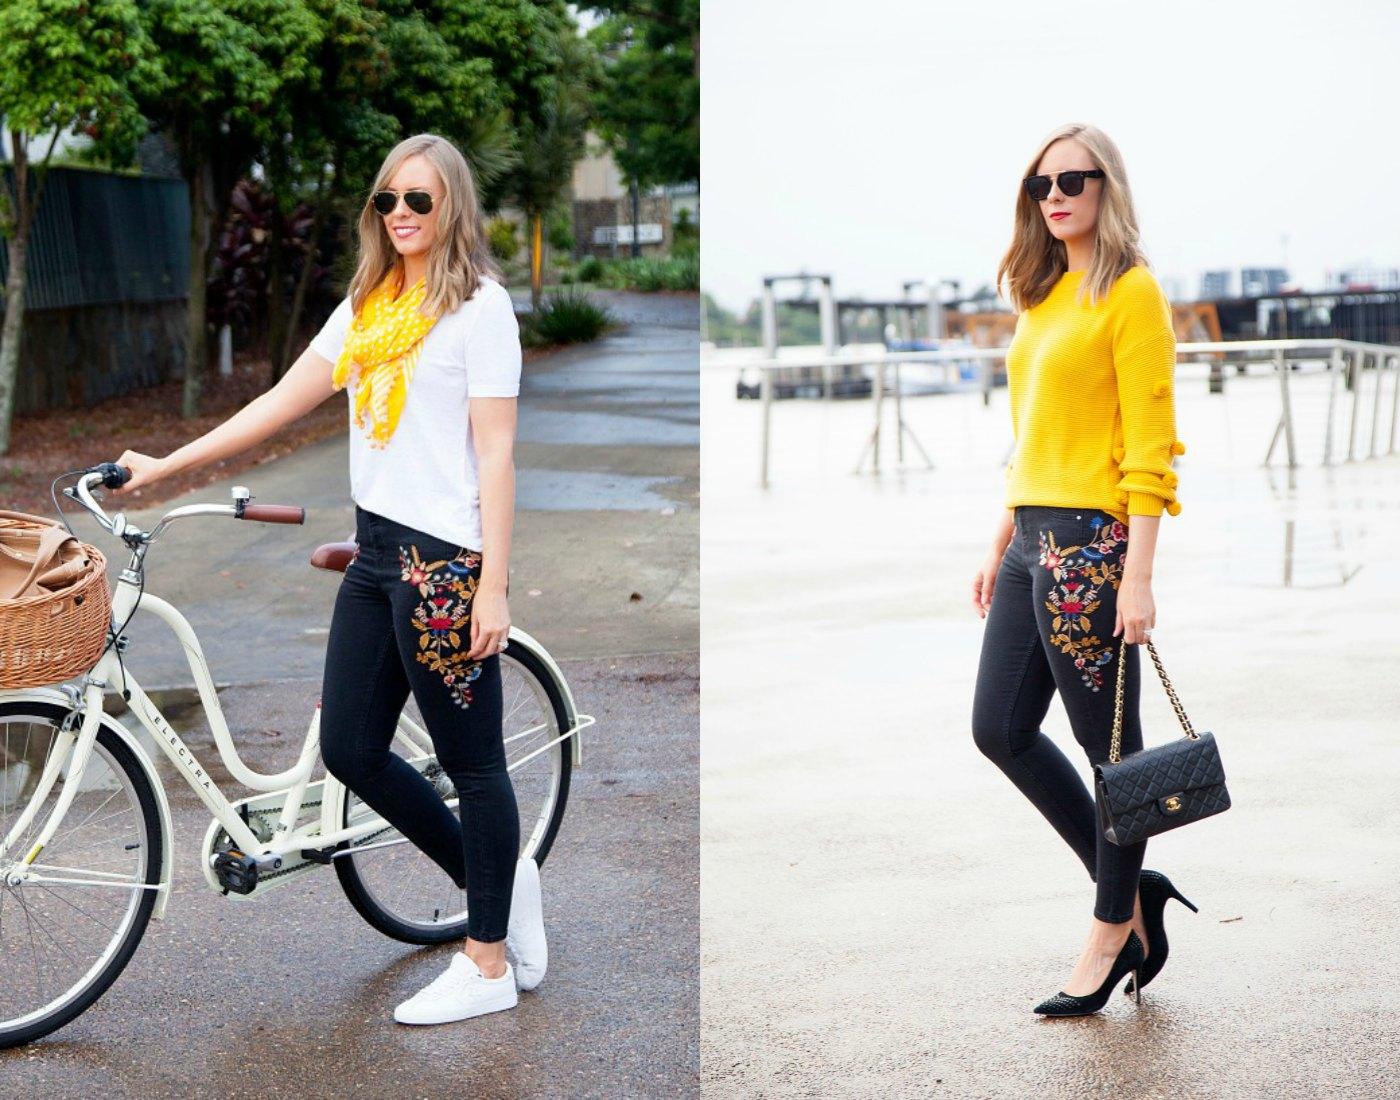 marigold fashion trend outfit ideas fashion blogger lauren slade